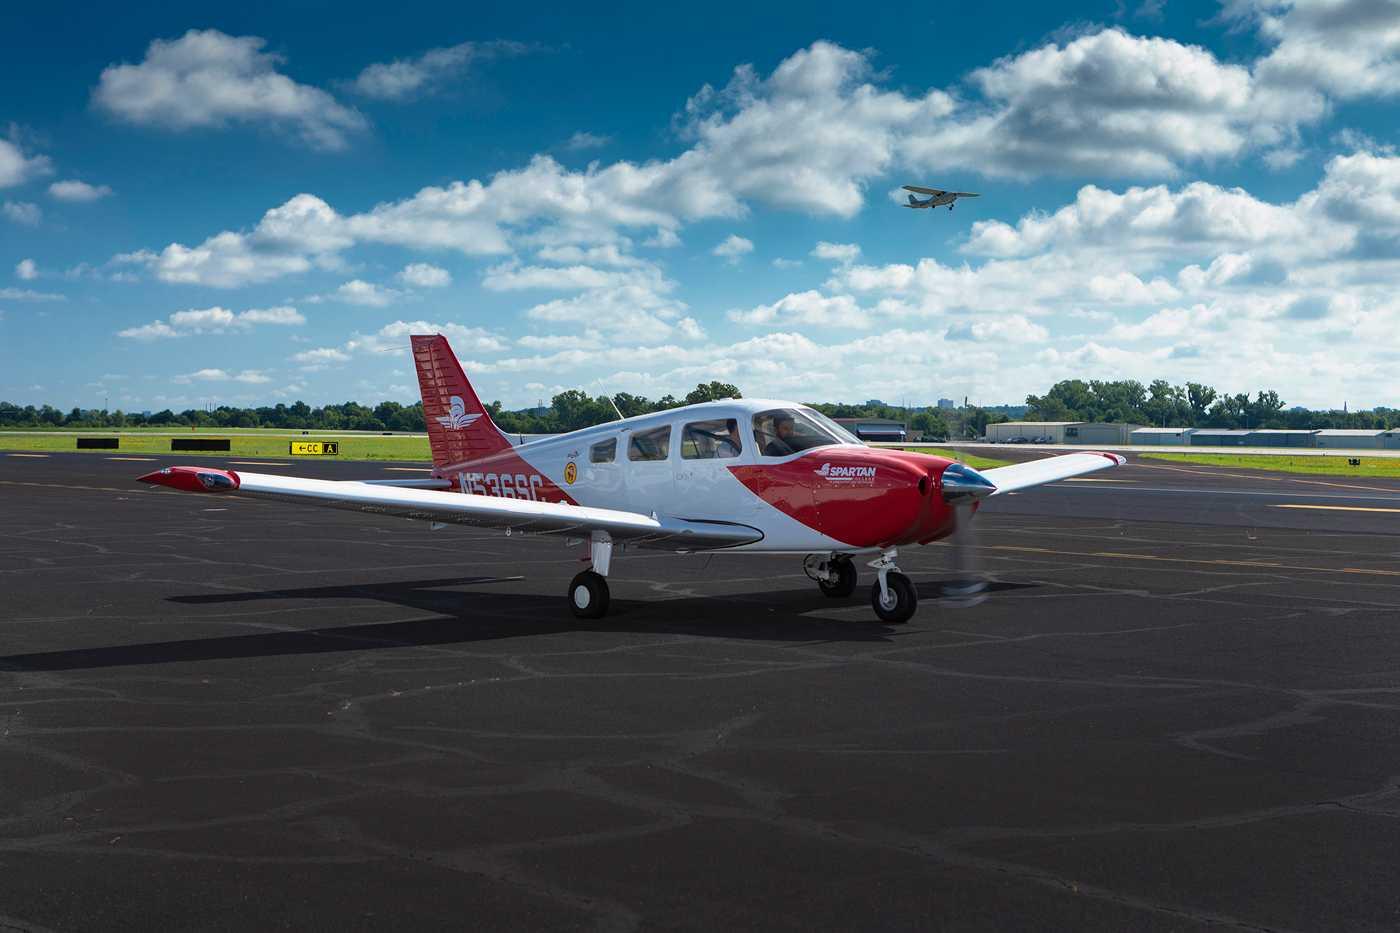 Spartan N536SC plane